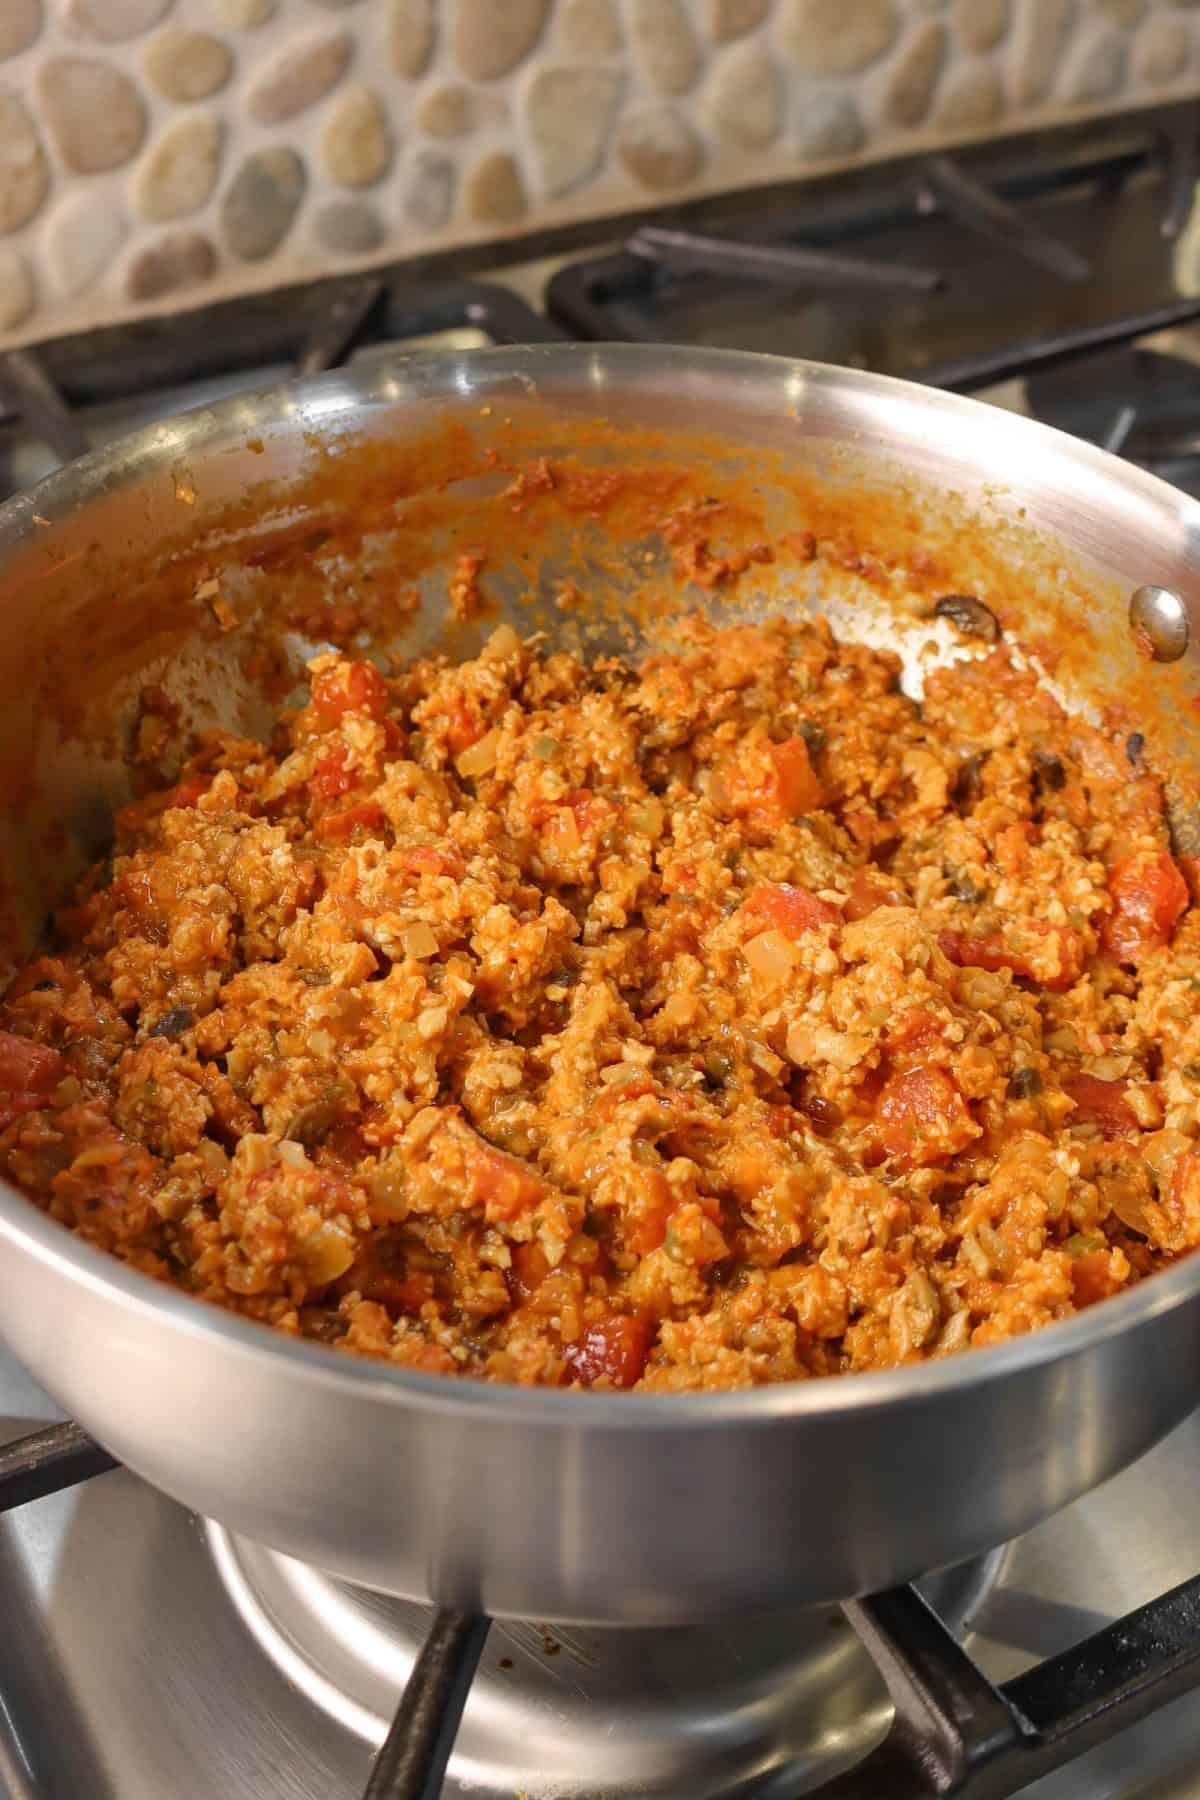 vegan spaghetti sauce in a pot